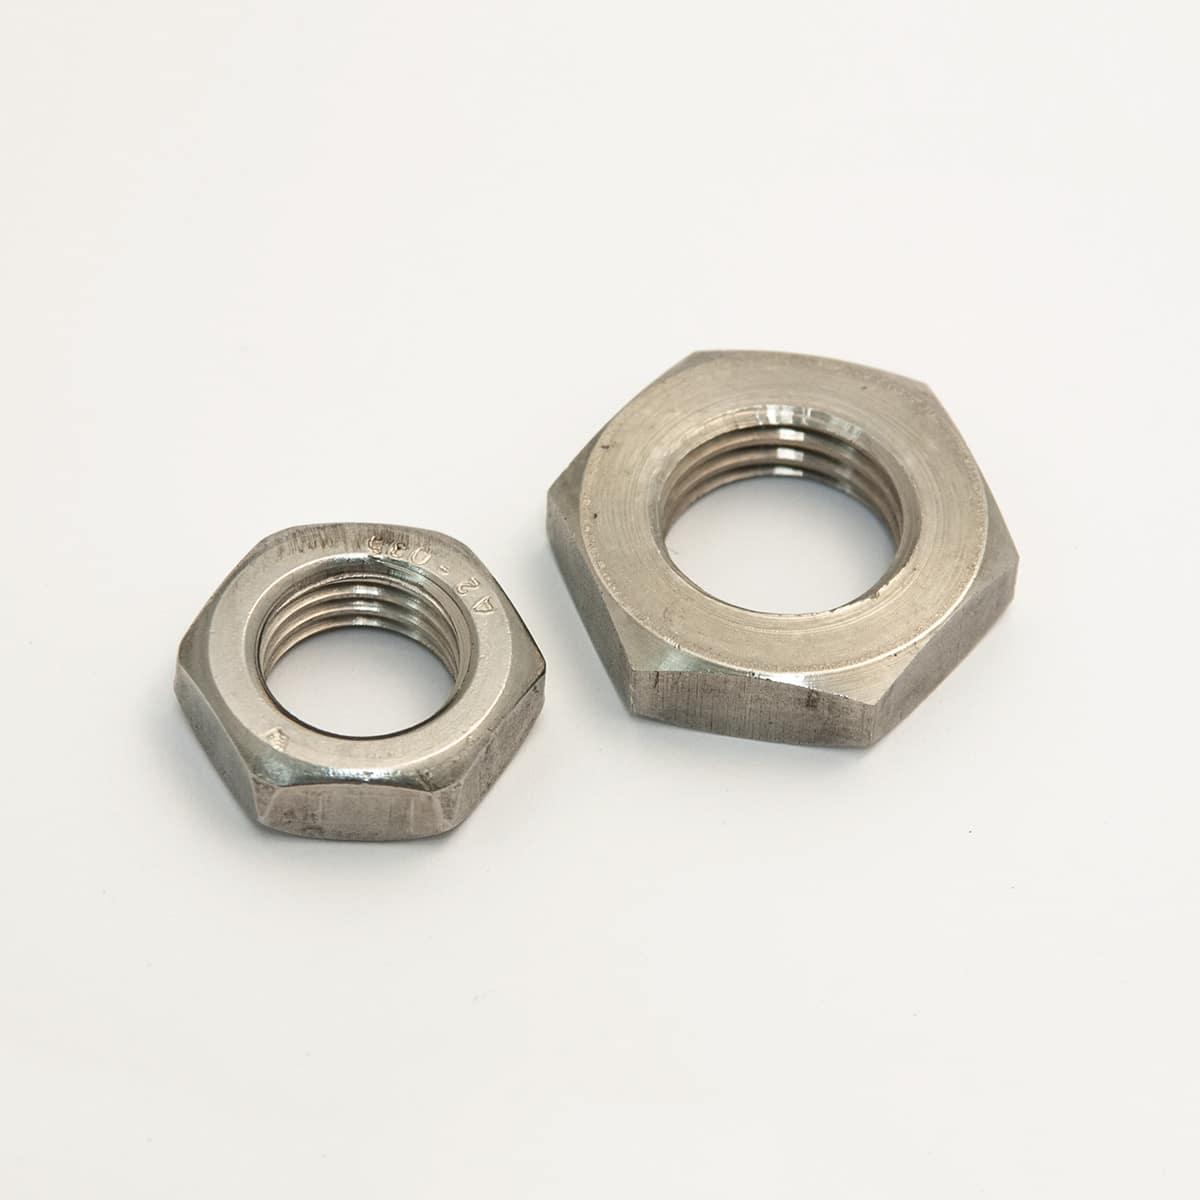 Short hexagonal nuts